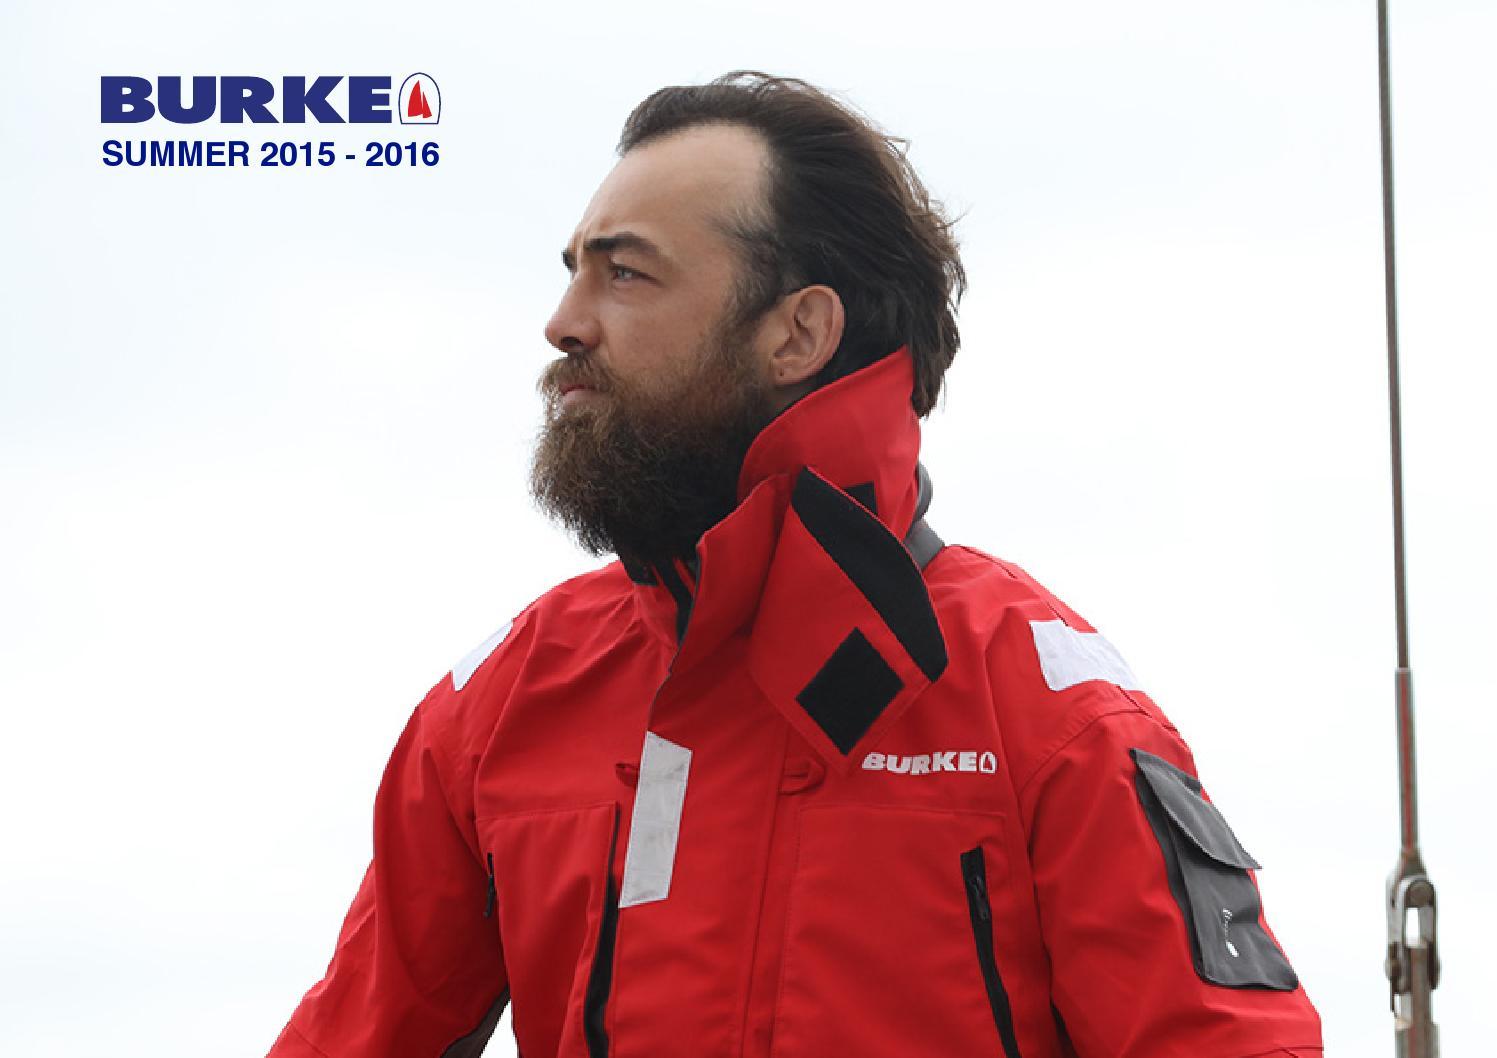 Burke Bass Jacket 100/% Waterproof Sailing//Yachting//Fishing// Safety Red CB10 New